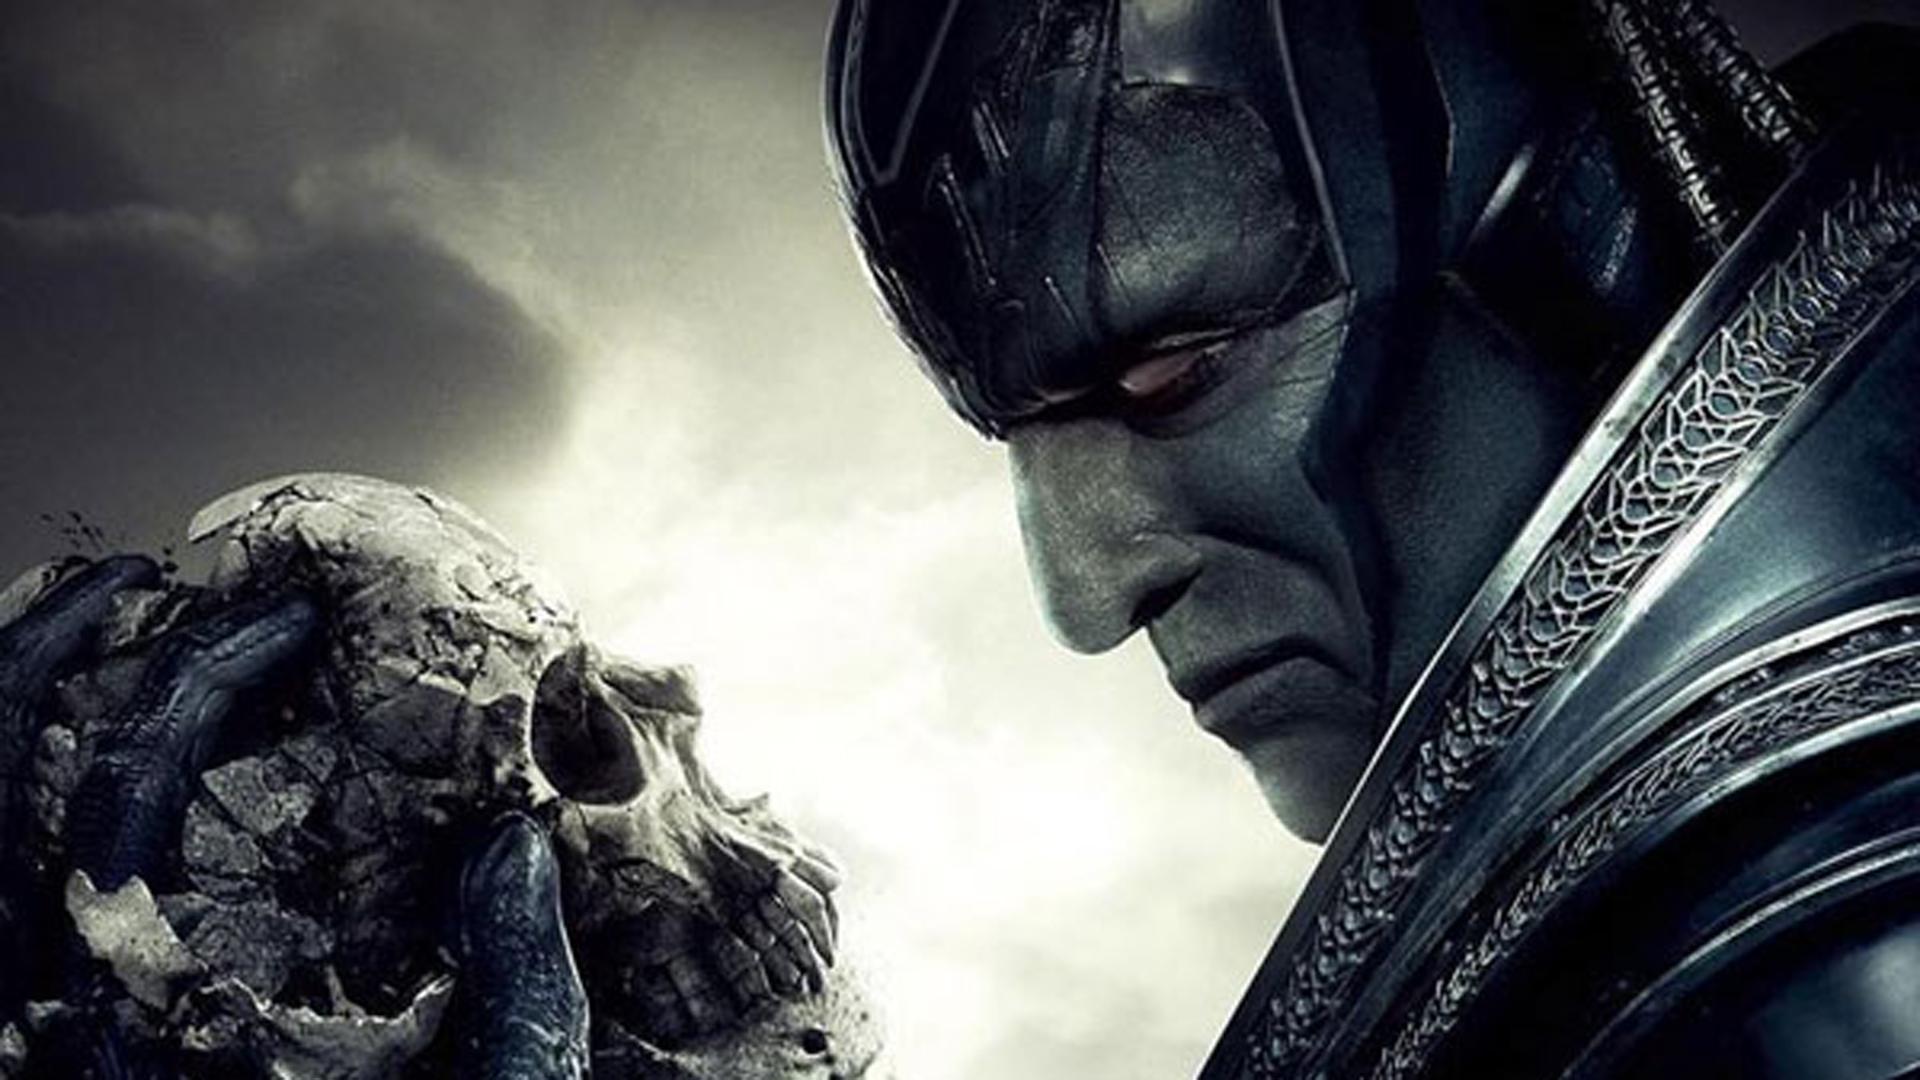 The History of Apocalypse, la nuova featurette